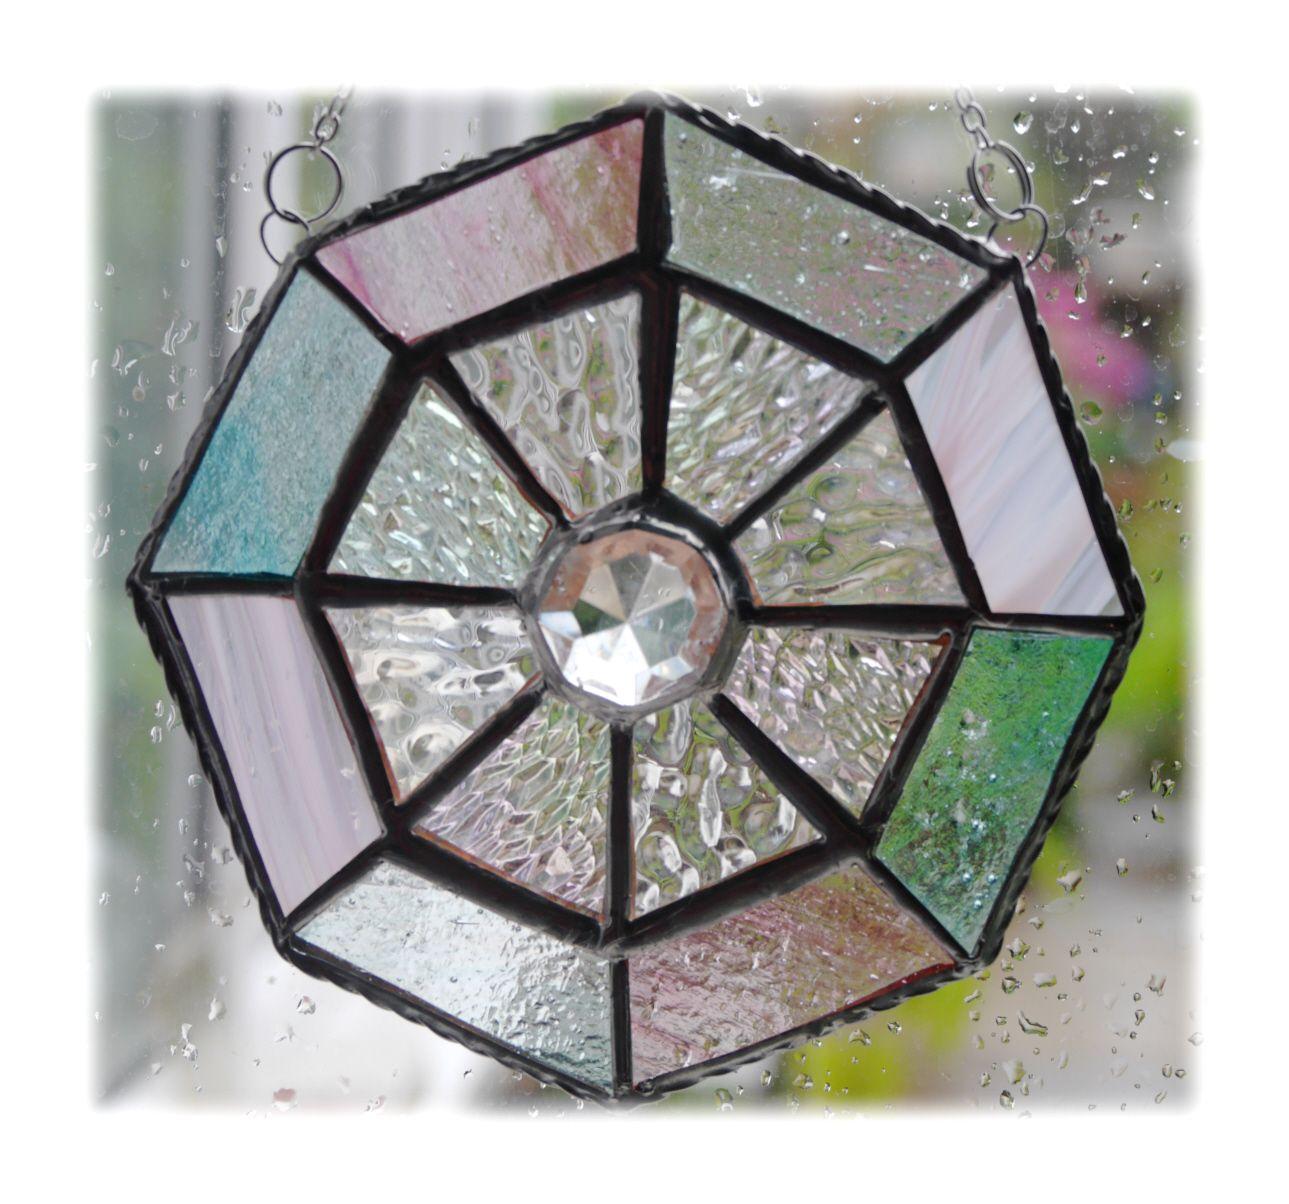 Crystal Octagon 007 #1808 FREE 17.50